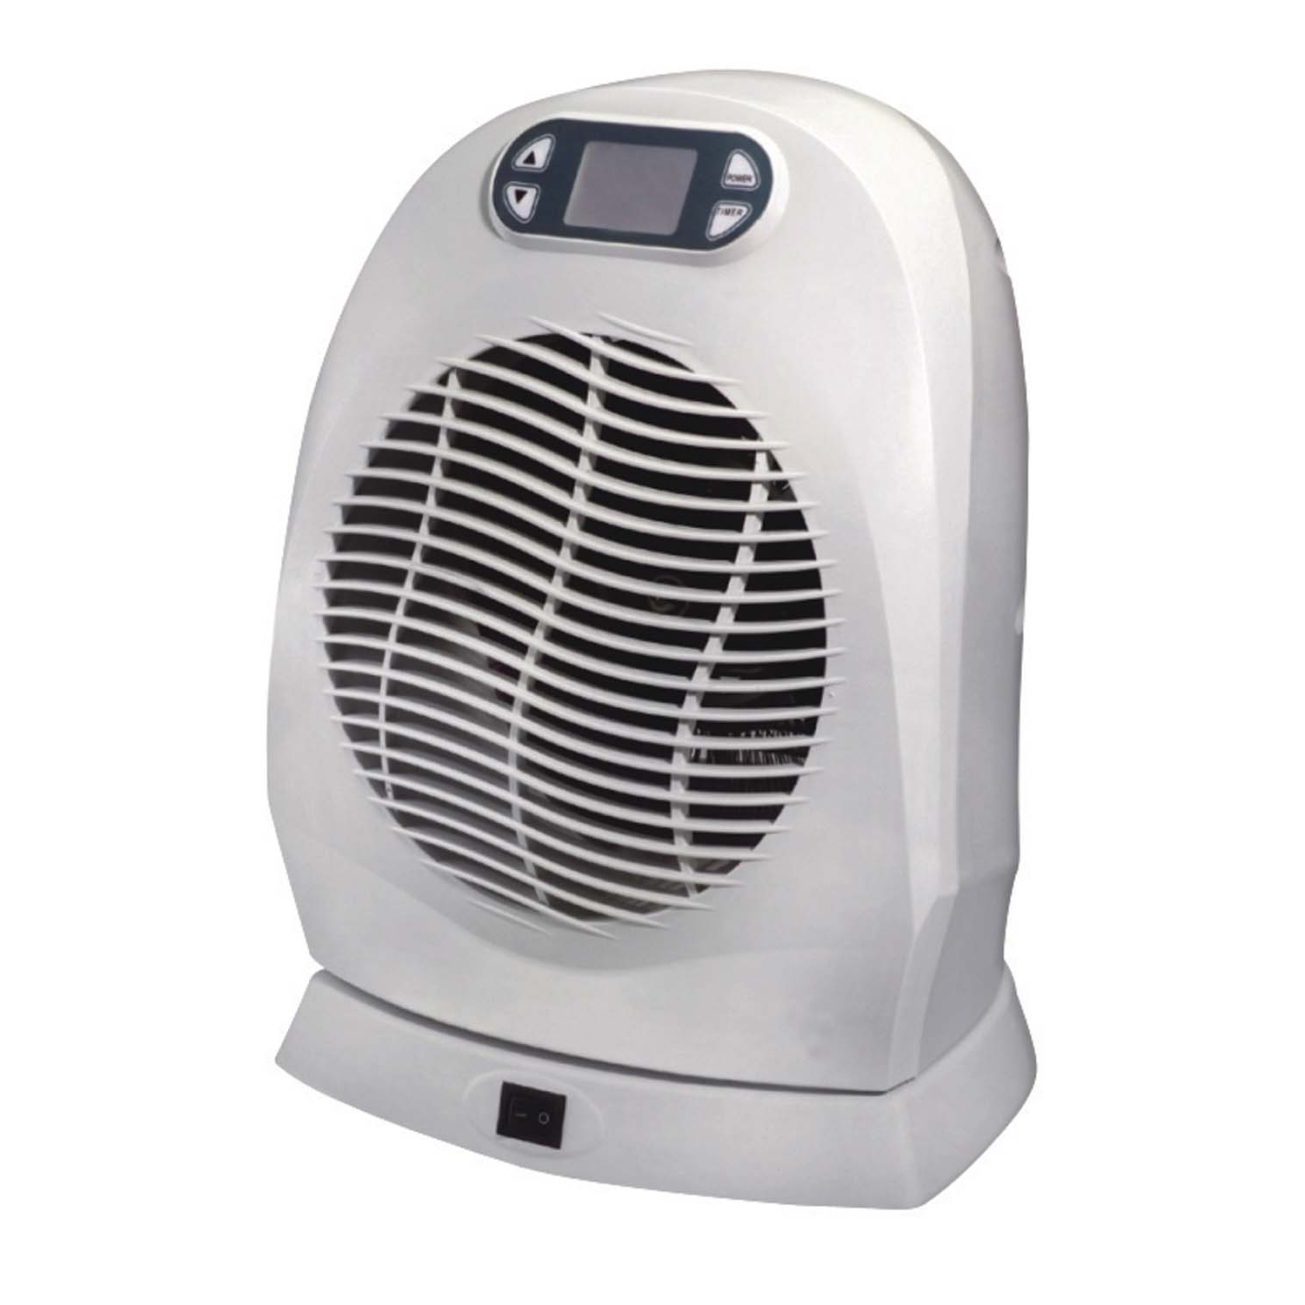 Pelonis HF-0019 Oscillating Heater, 1000/1500 W, Off-White at Sears.com